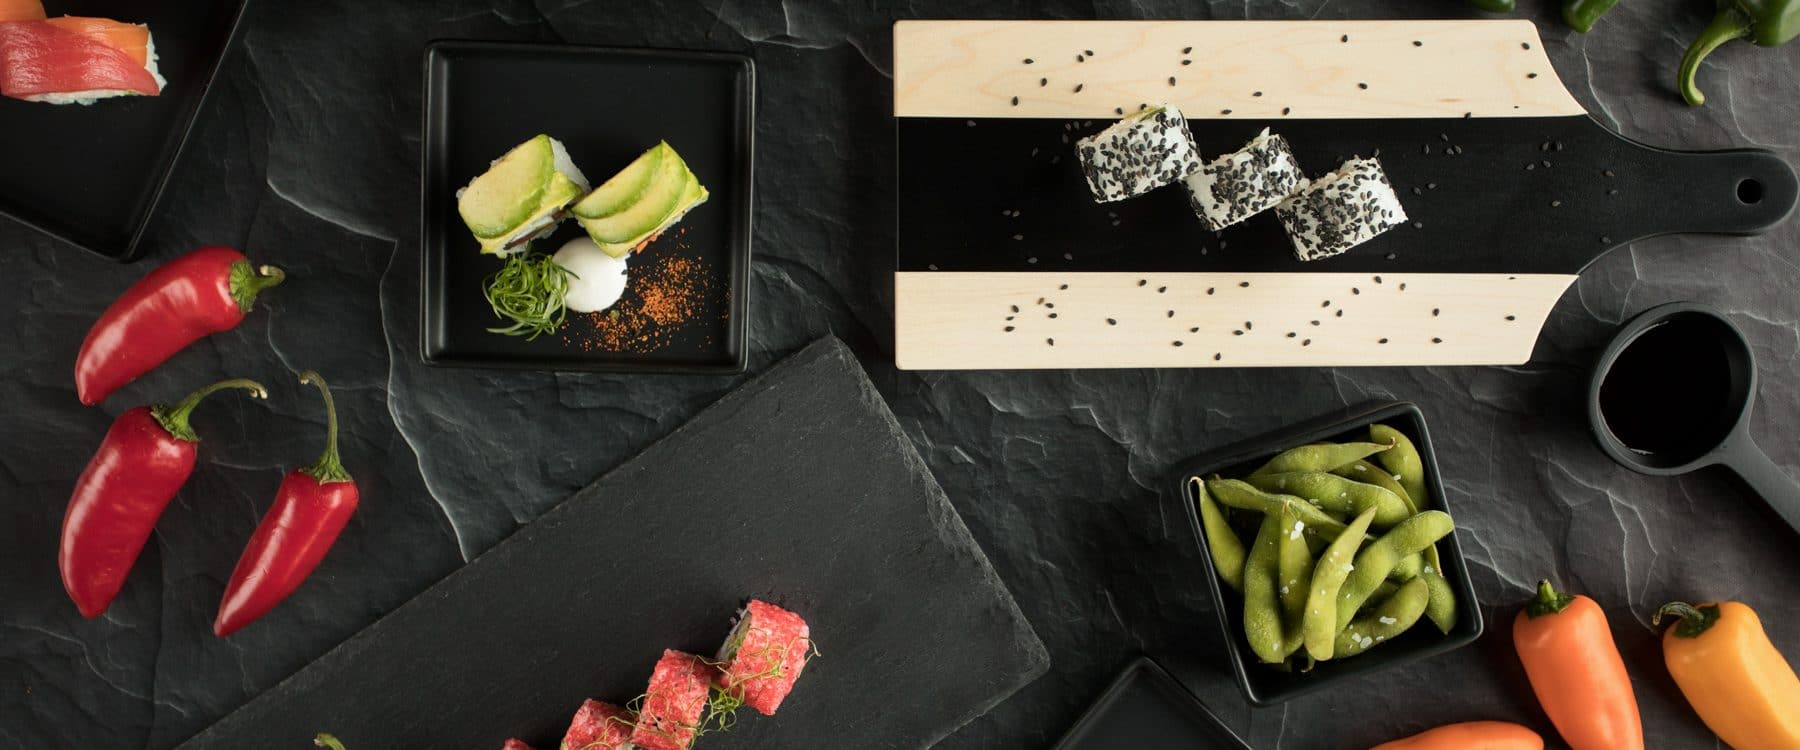 SushiFork-Tulsa-Oklahoma-Sushi-Restaurant - Catering